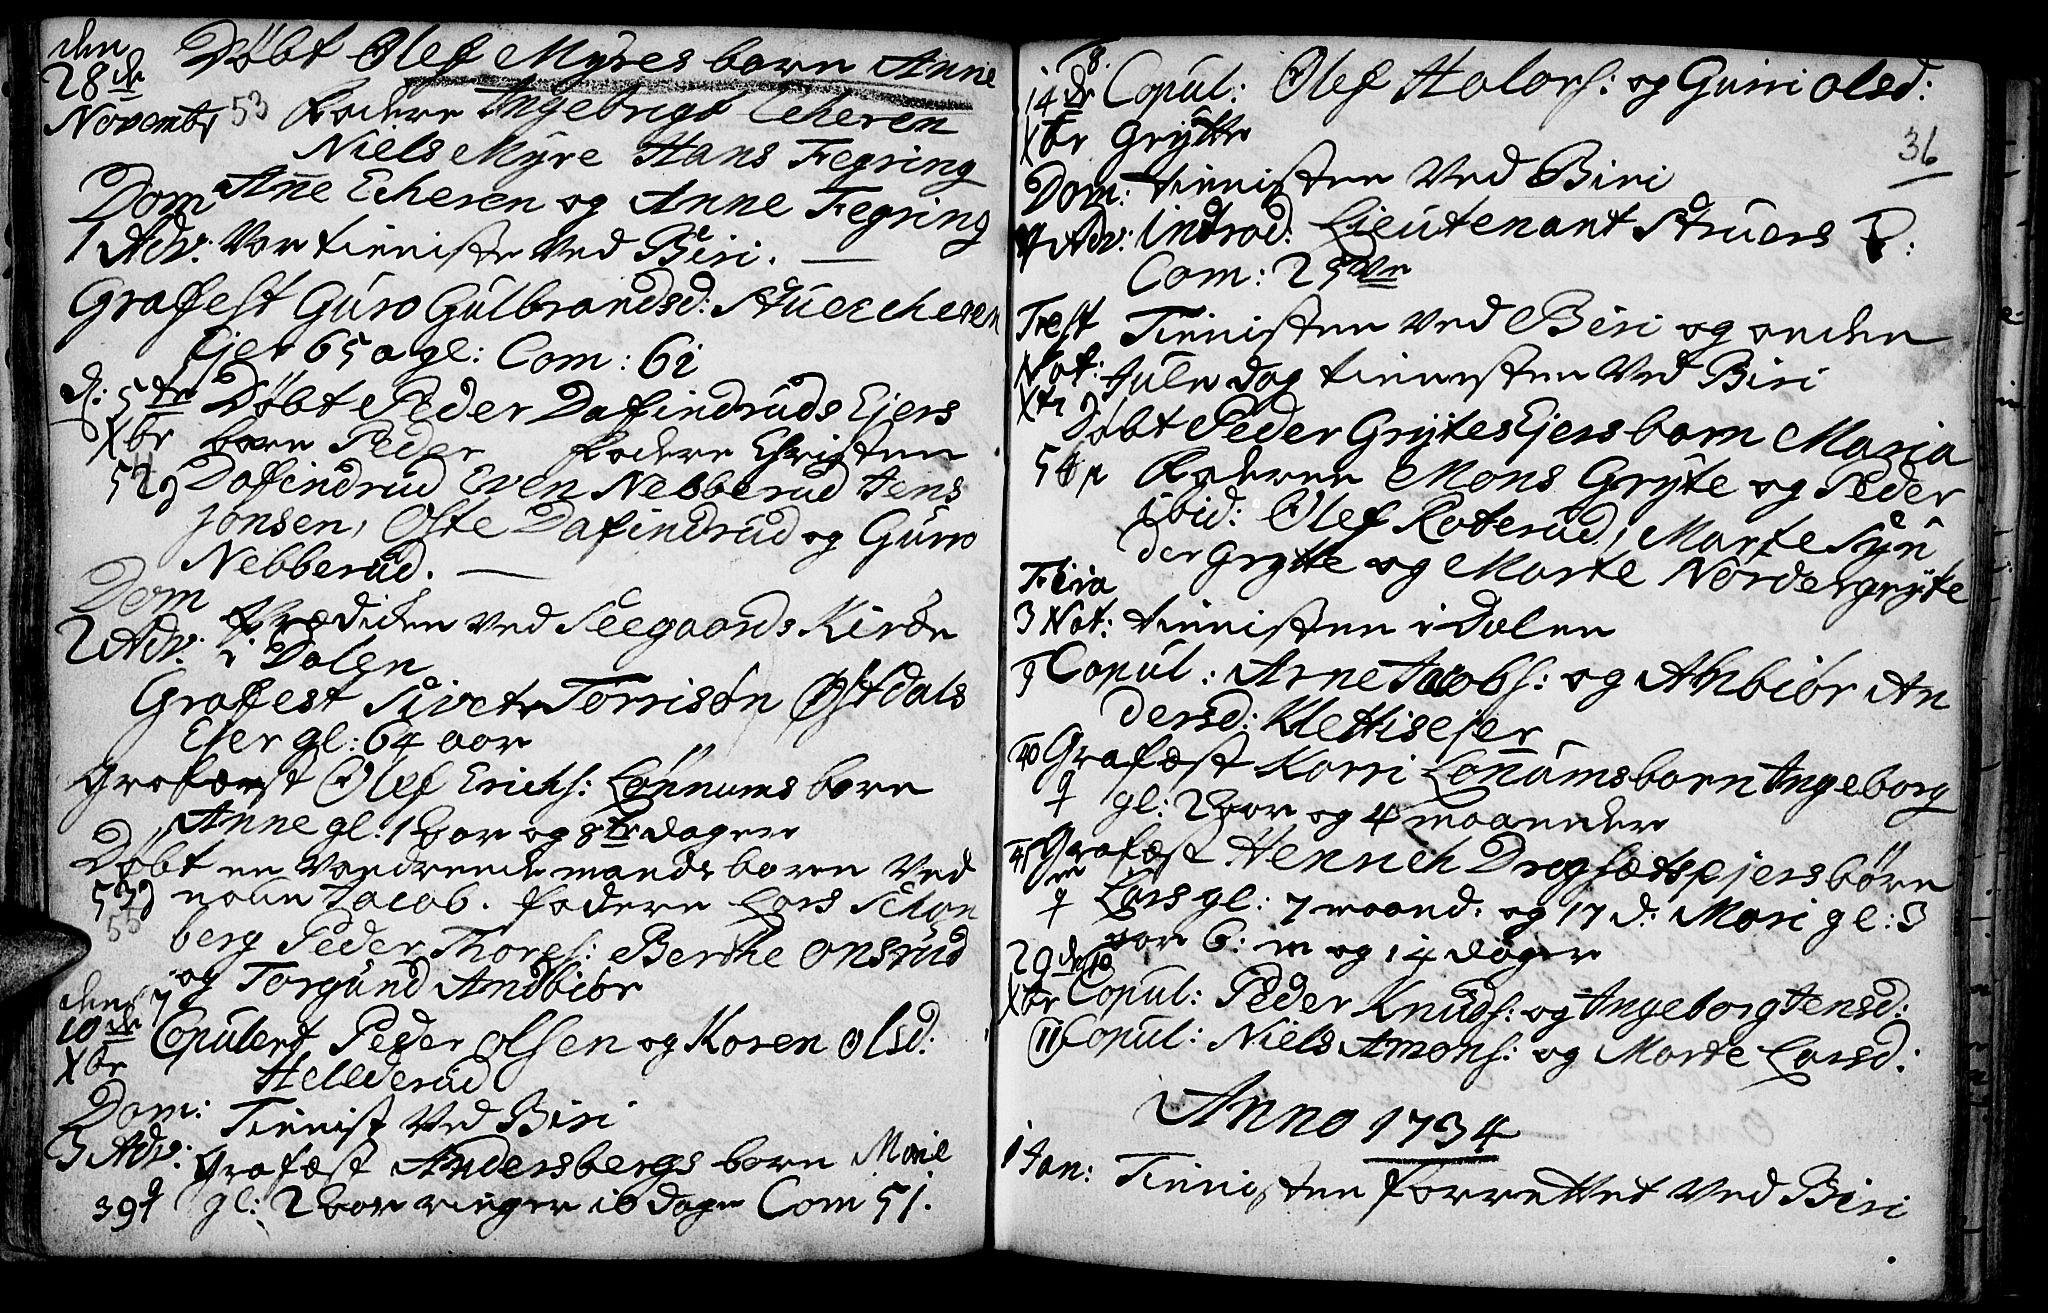 SAH, Biri prestekontor, Ministerialbok nr. 1, 1730-1754, s. 36